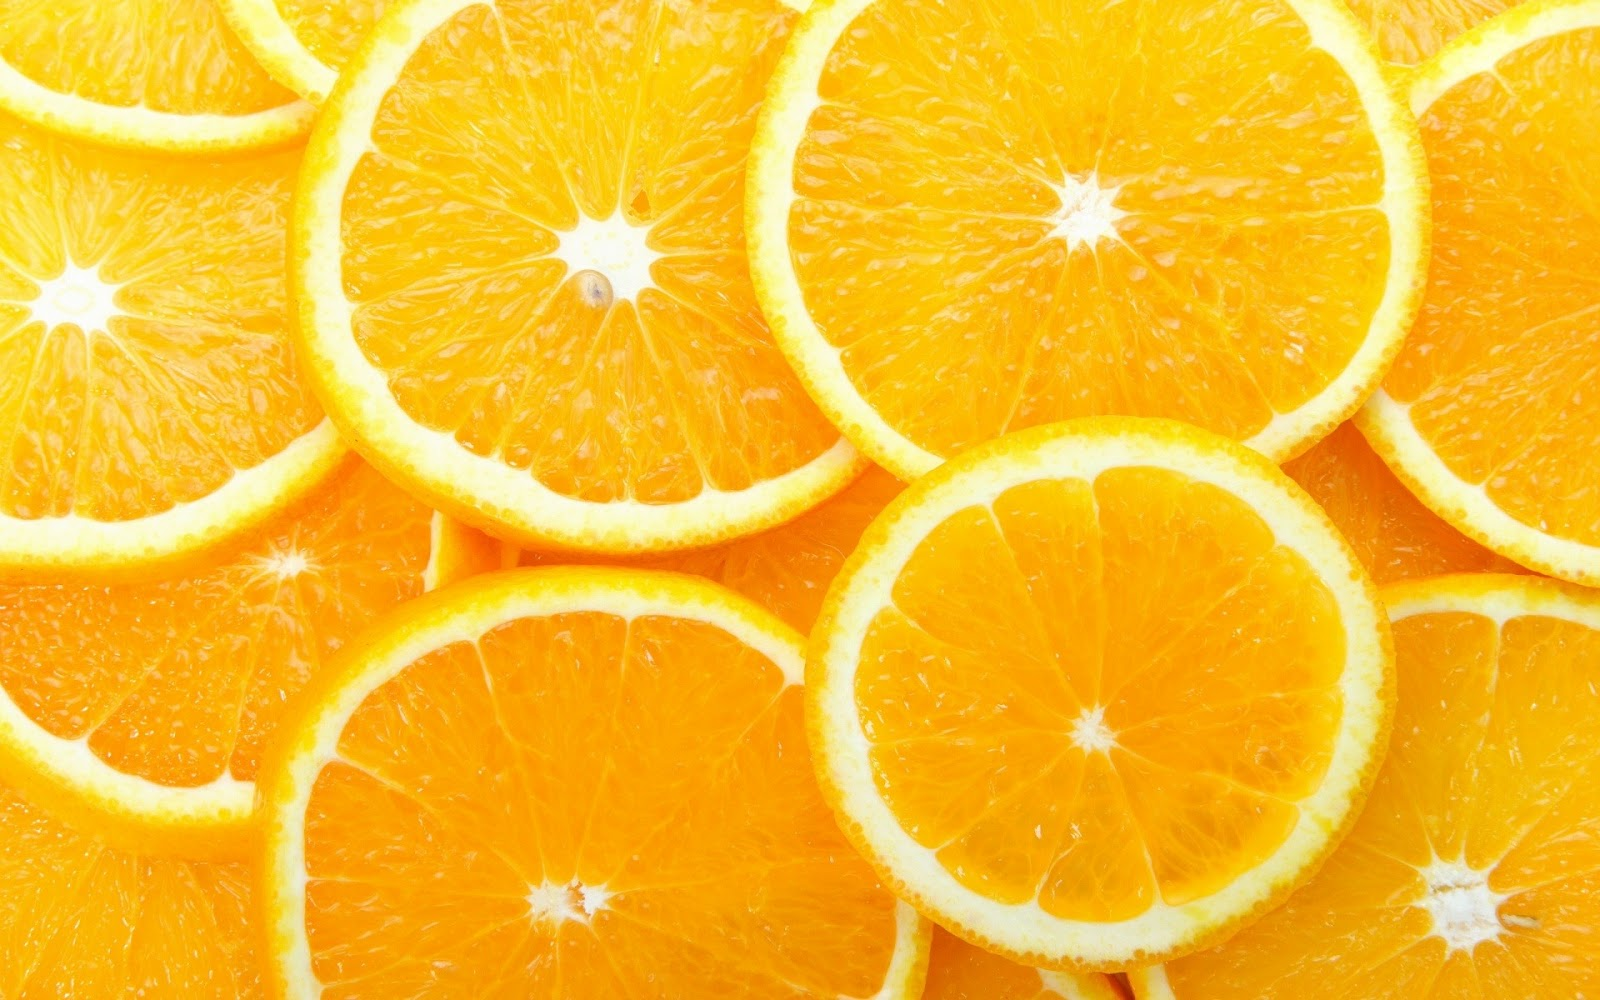 http://2.bp.blogspot.com/-KnsBR4yAJNk/UHBMA88HDpI/AAAAAAAAnEk/7wn9Z1mHwa8/s1600/Orange_Slices_by+paras31_.jpg